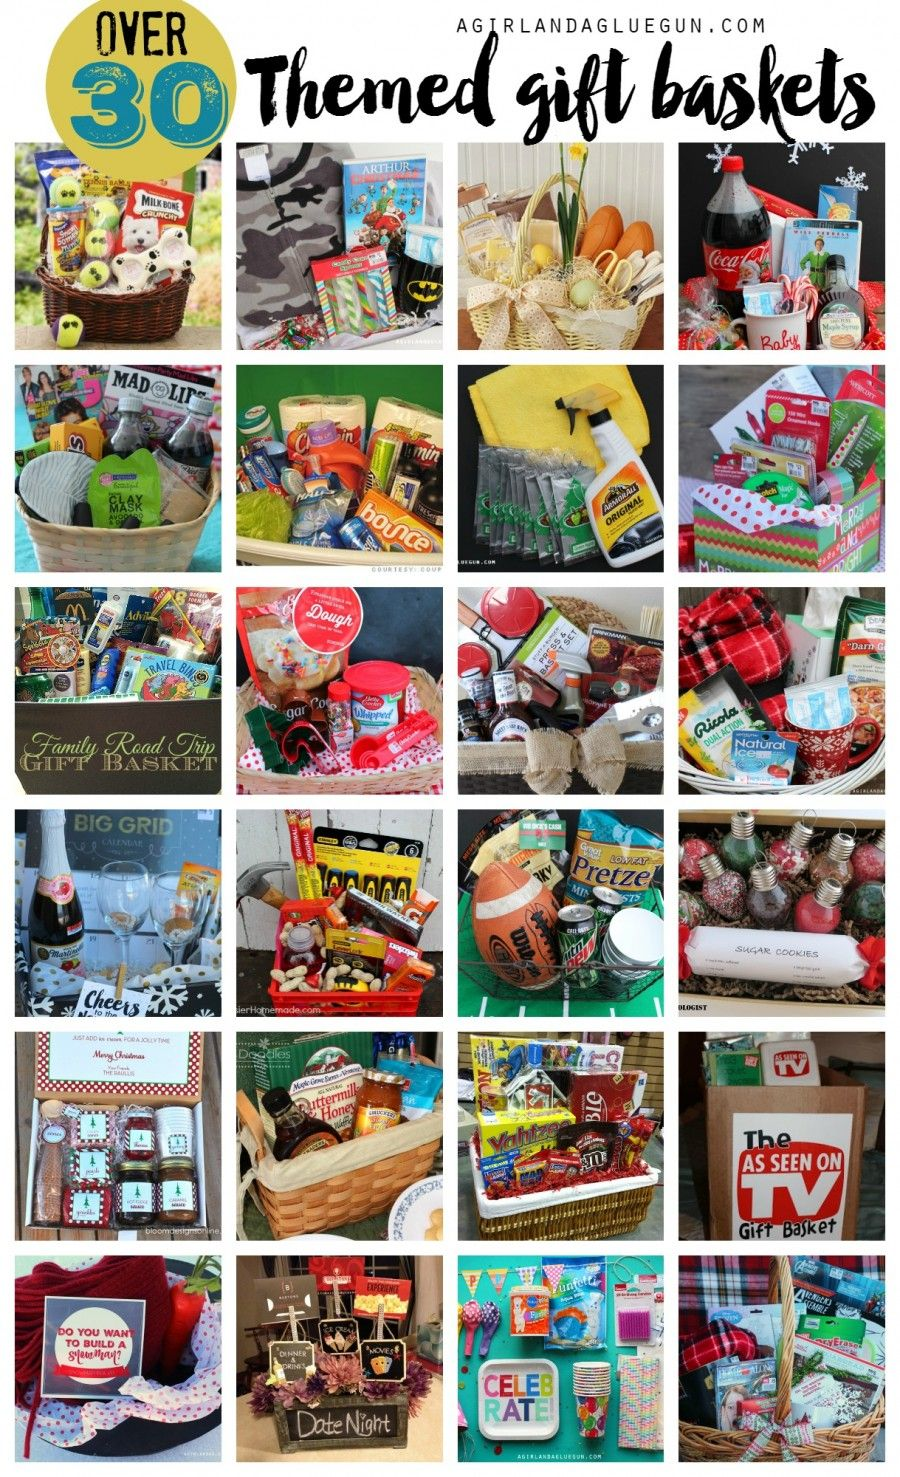 Themed gift basket roundup | diy | Pinterest | Gift baskets, Gifts ...